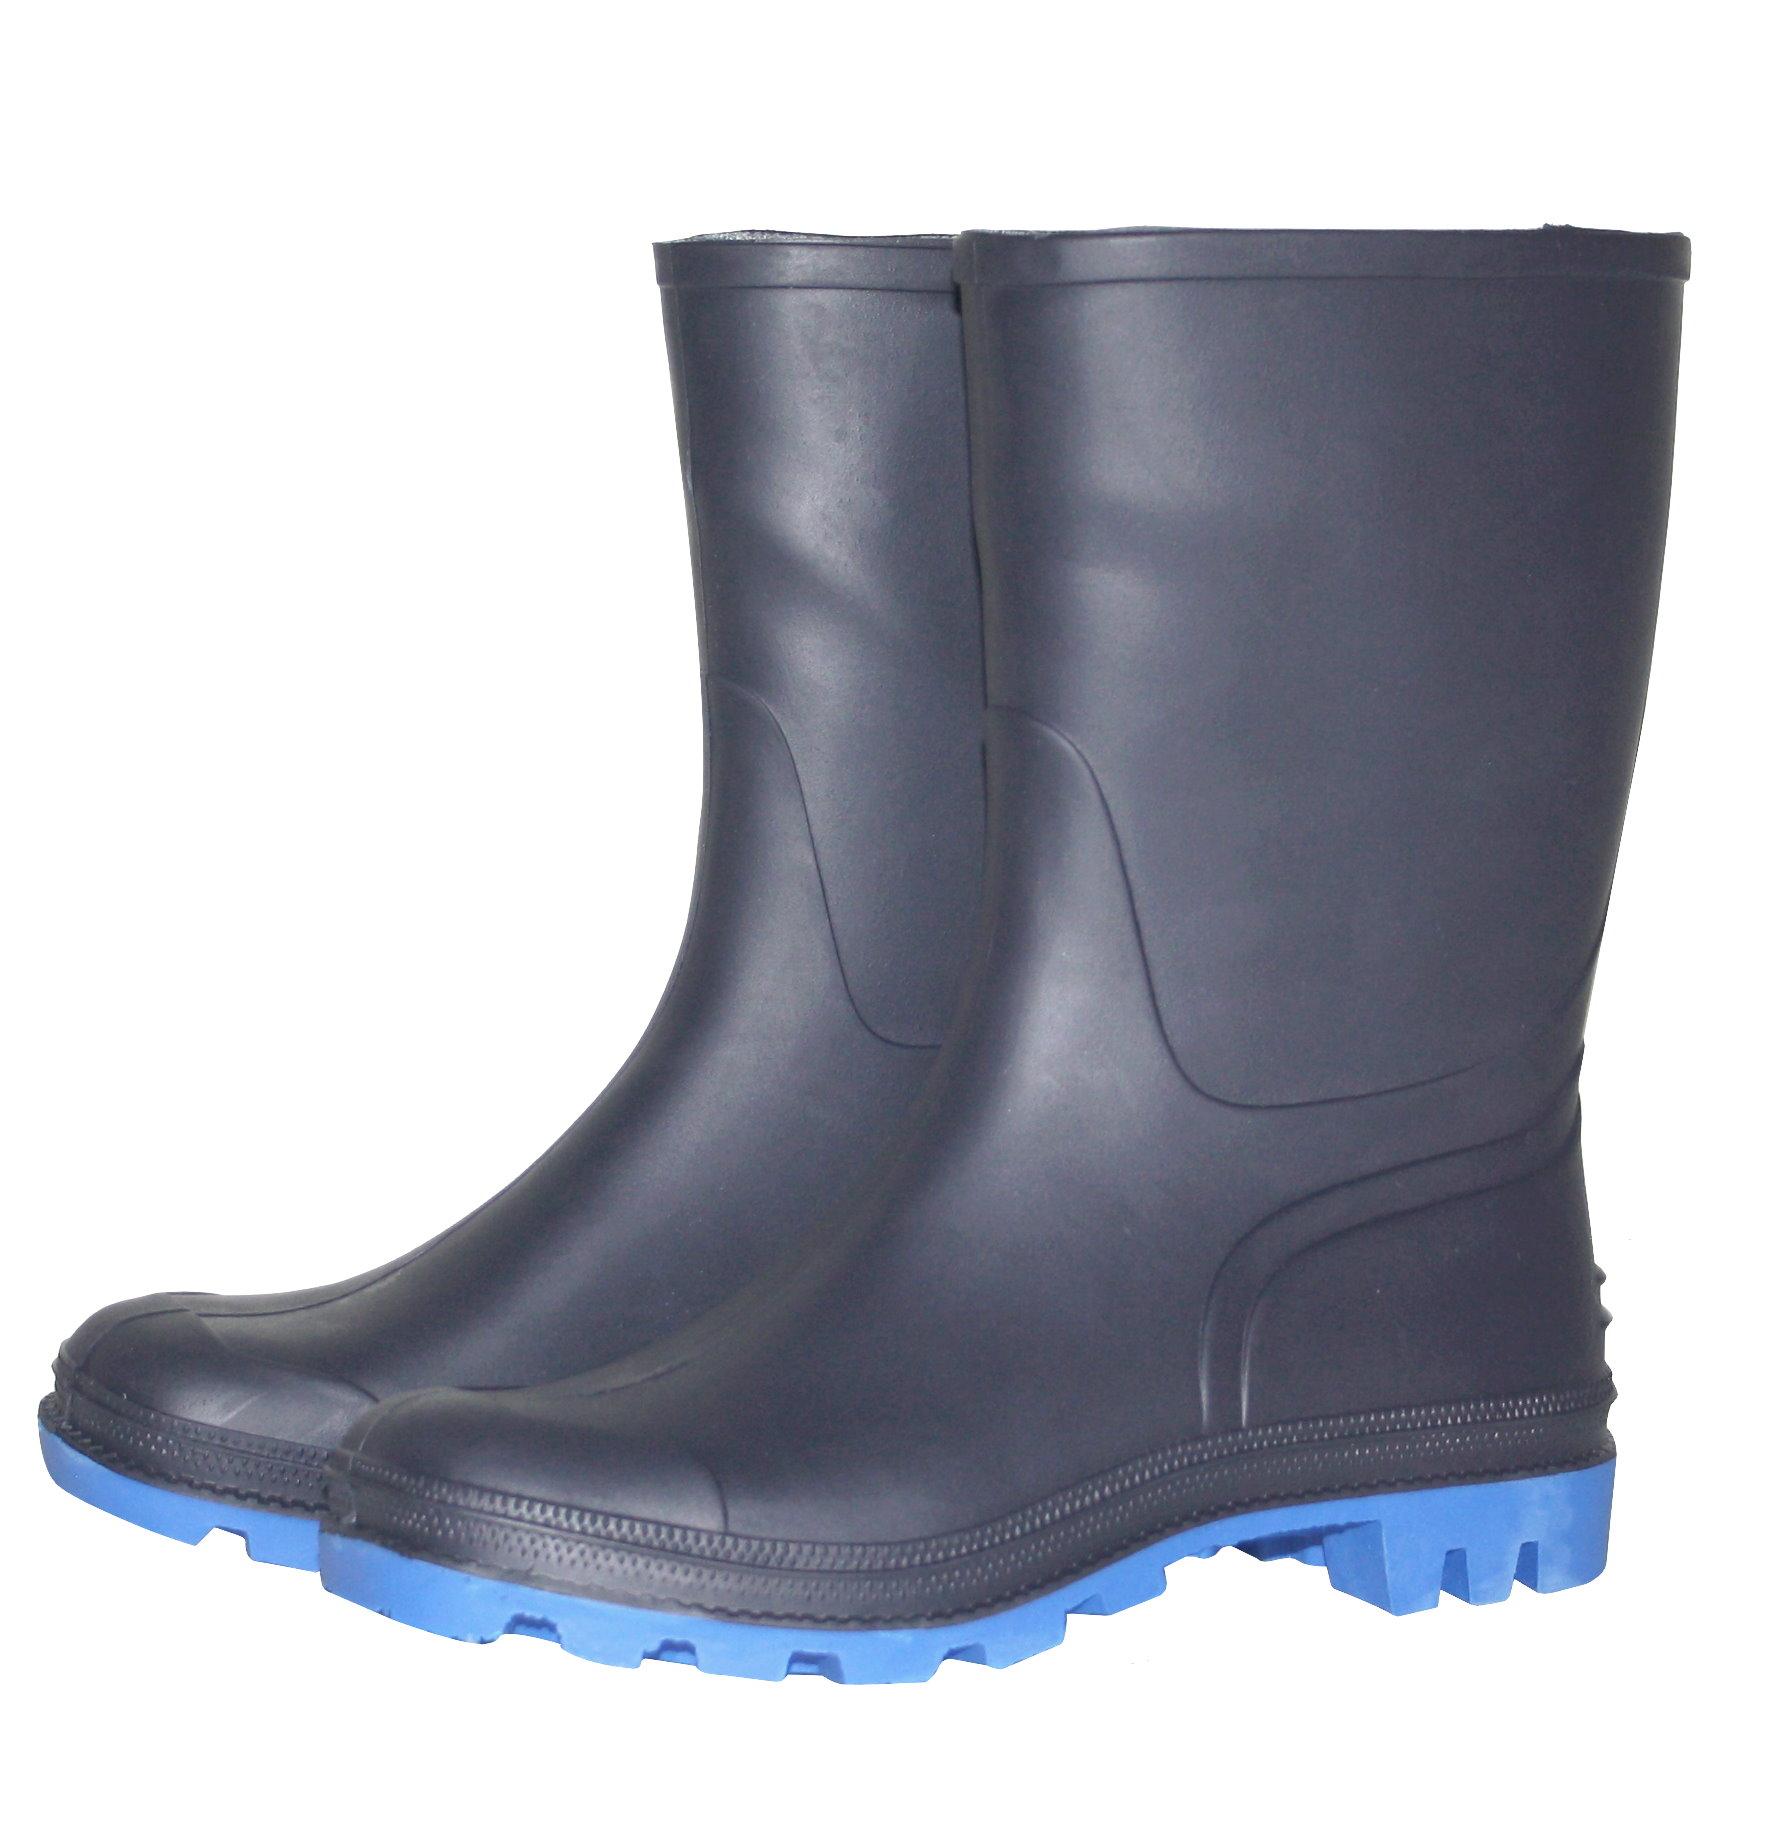 buy popular 0dcca 5acf3 Bockstiegel Herren Gummistiefel Gr. 41-45 Regenstiefel Stiefel Stiefelette  blau